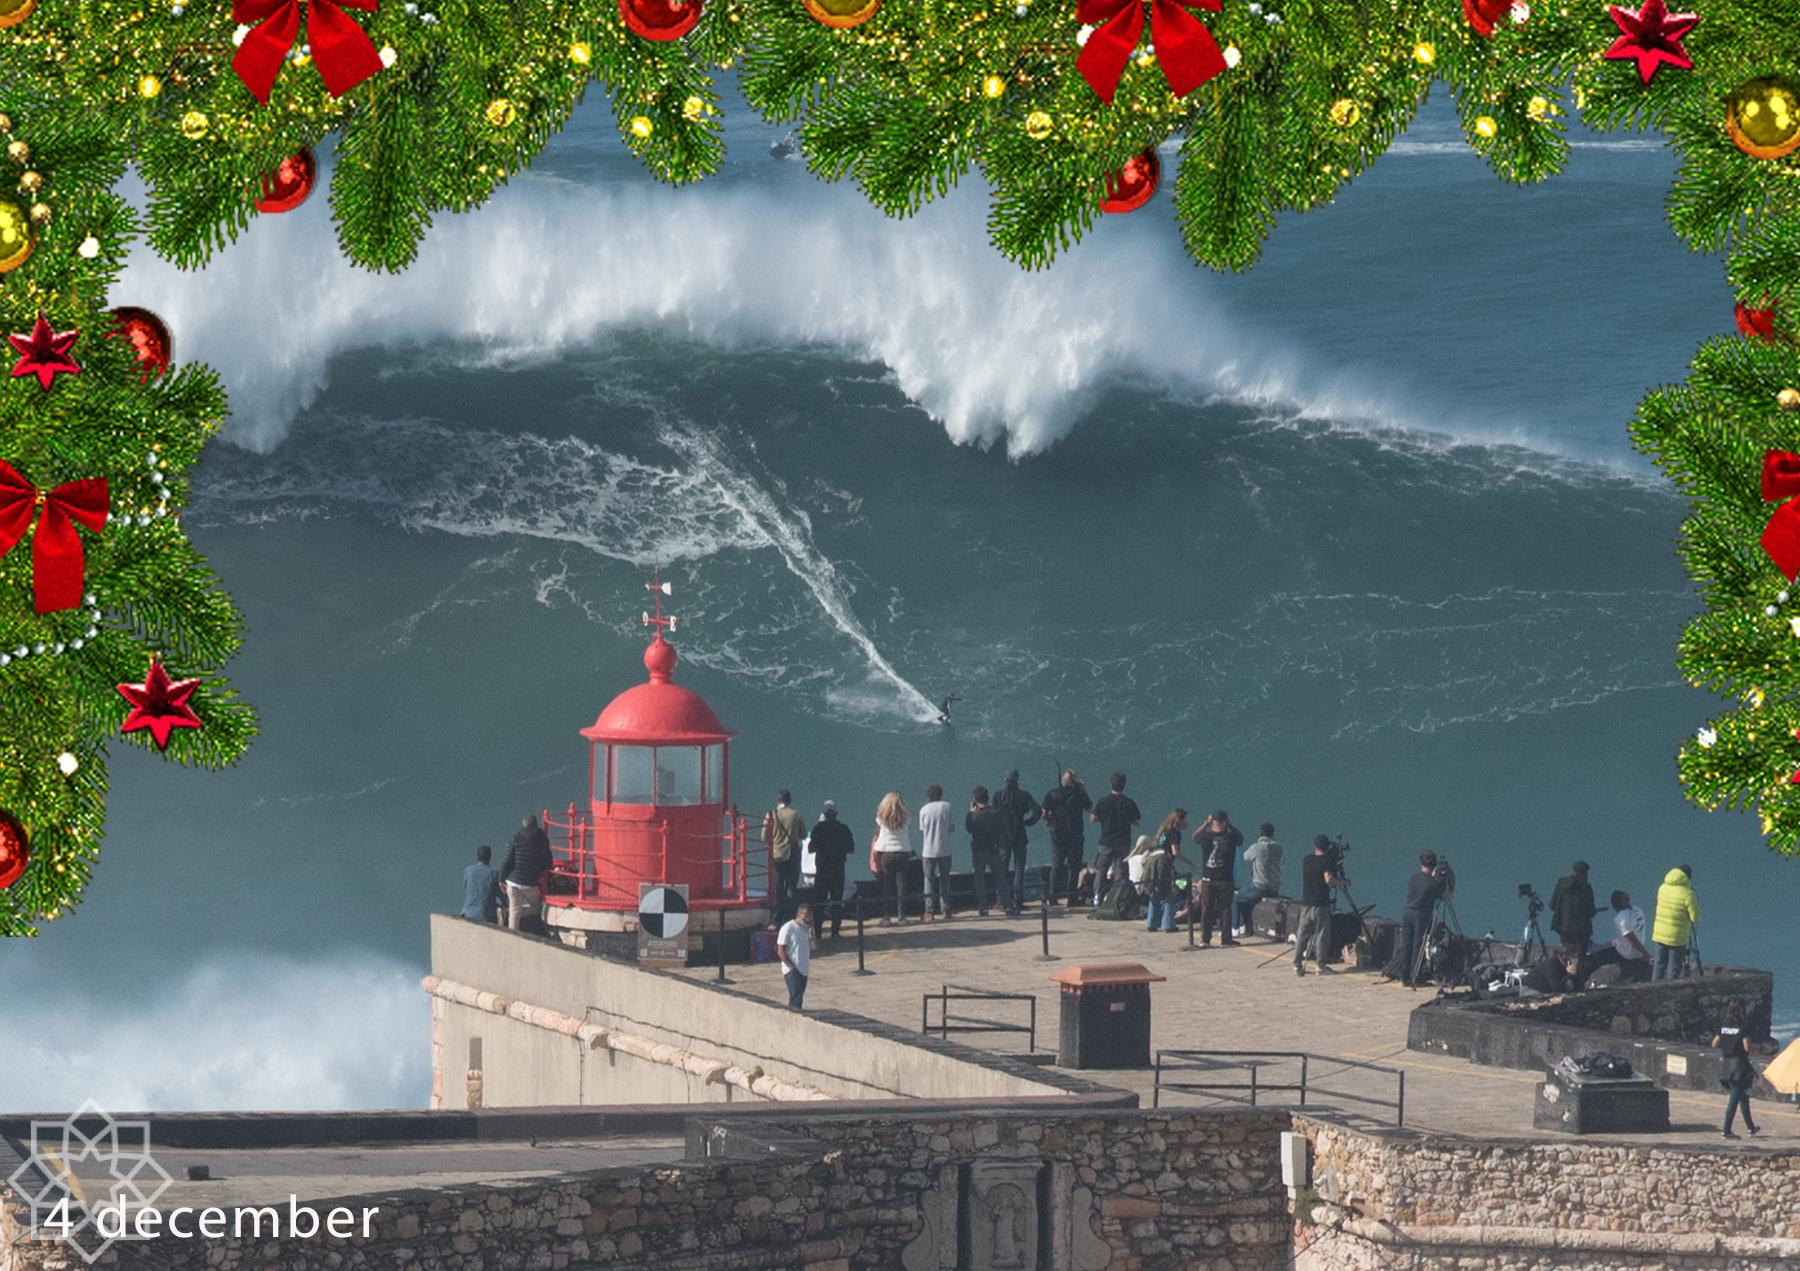 December 4 year 2020 Portugal